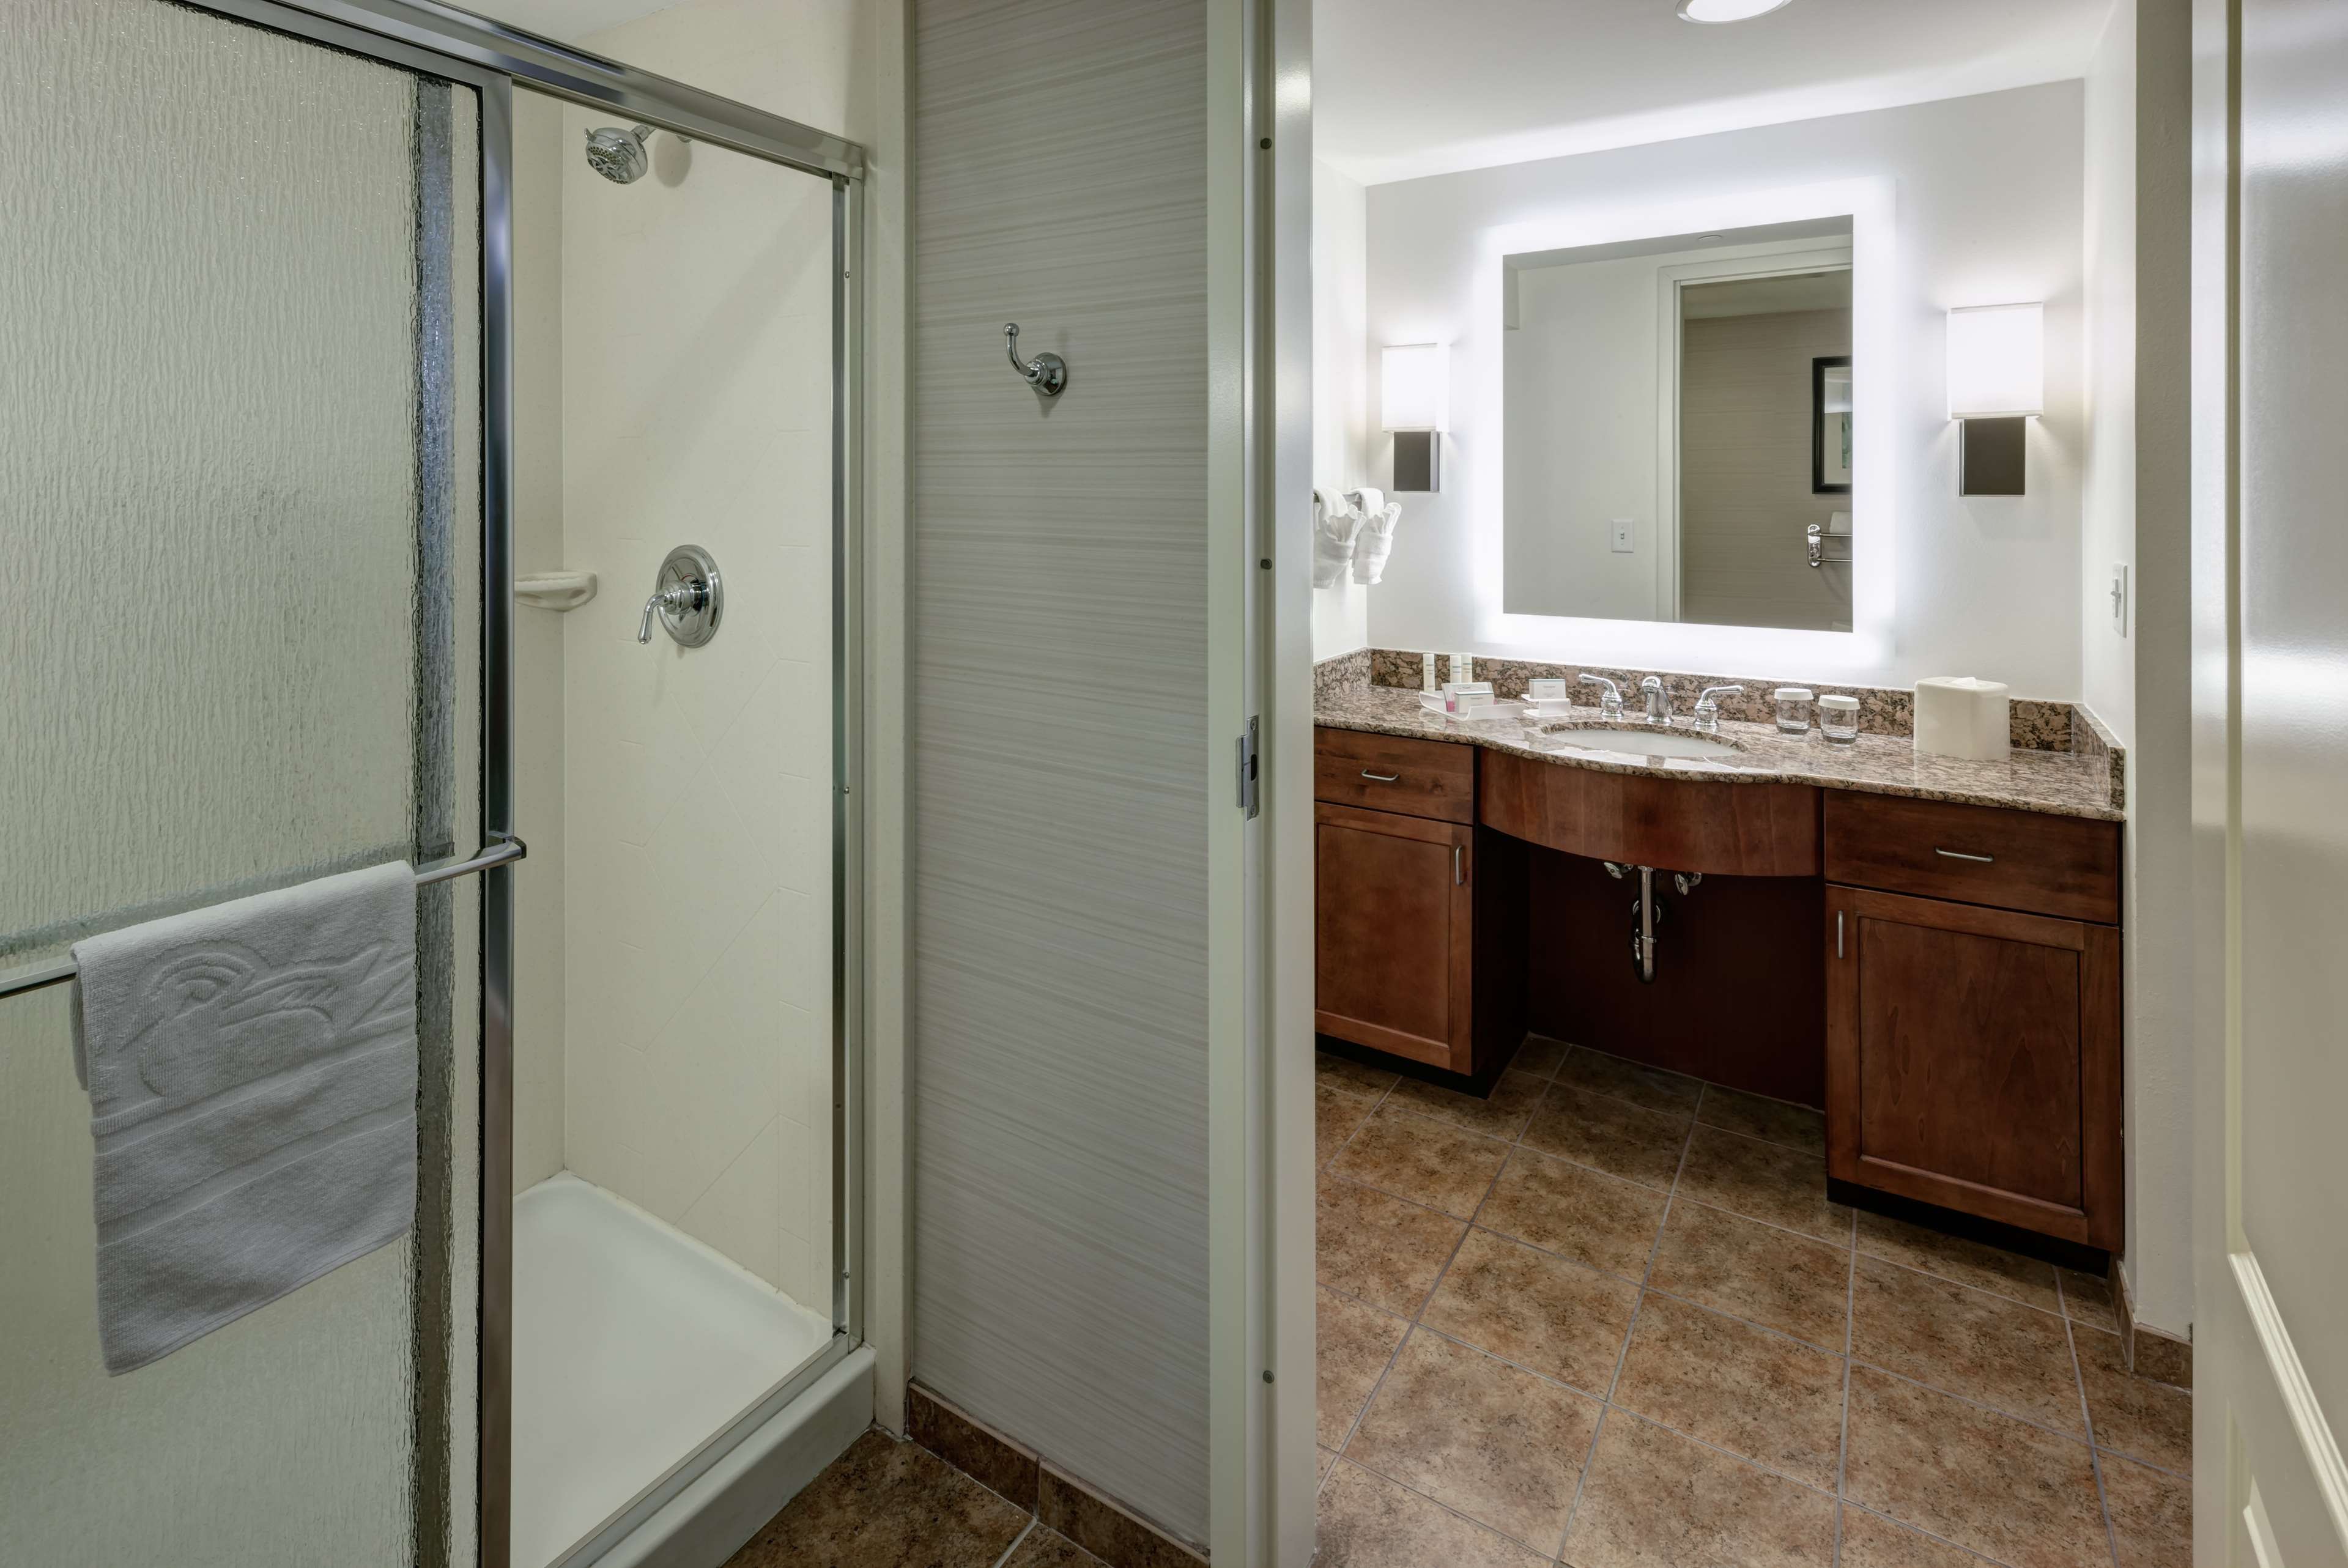 Homewood Suites by Hilton Denton image 28